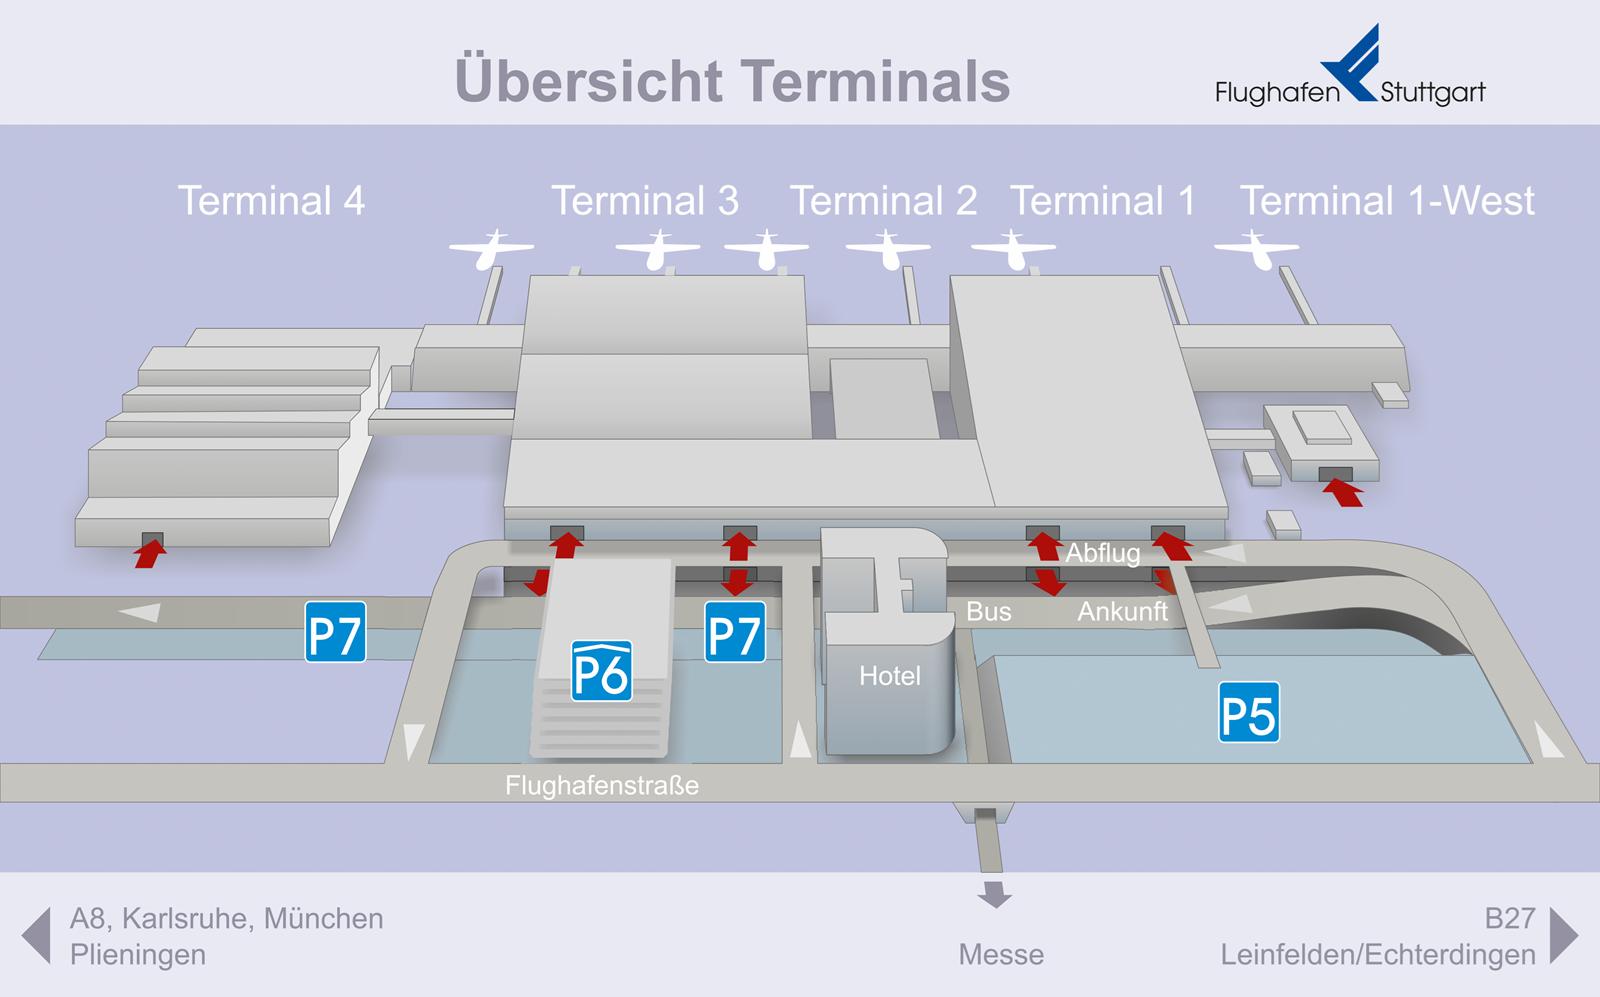 http://www.stuttgart-airport.com/at-the-airport/terminal-guide